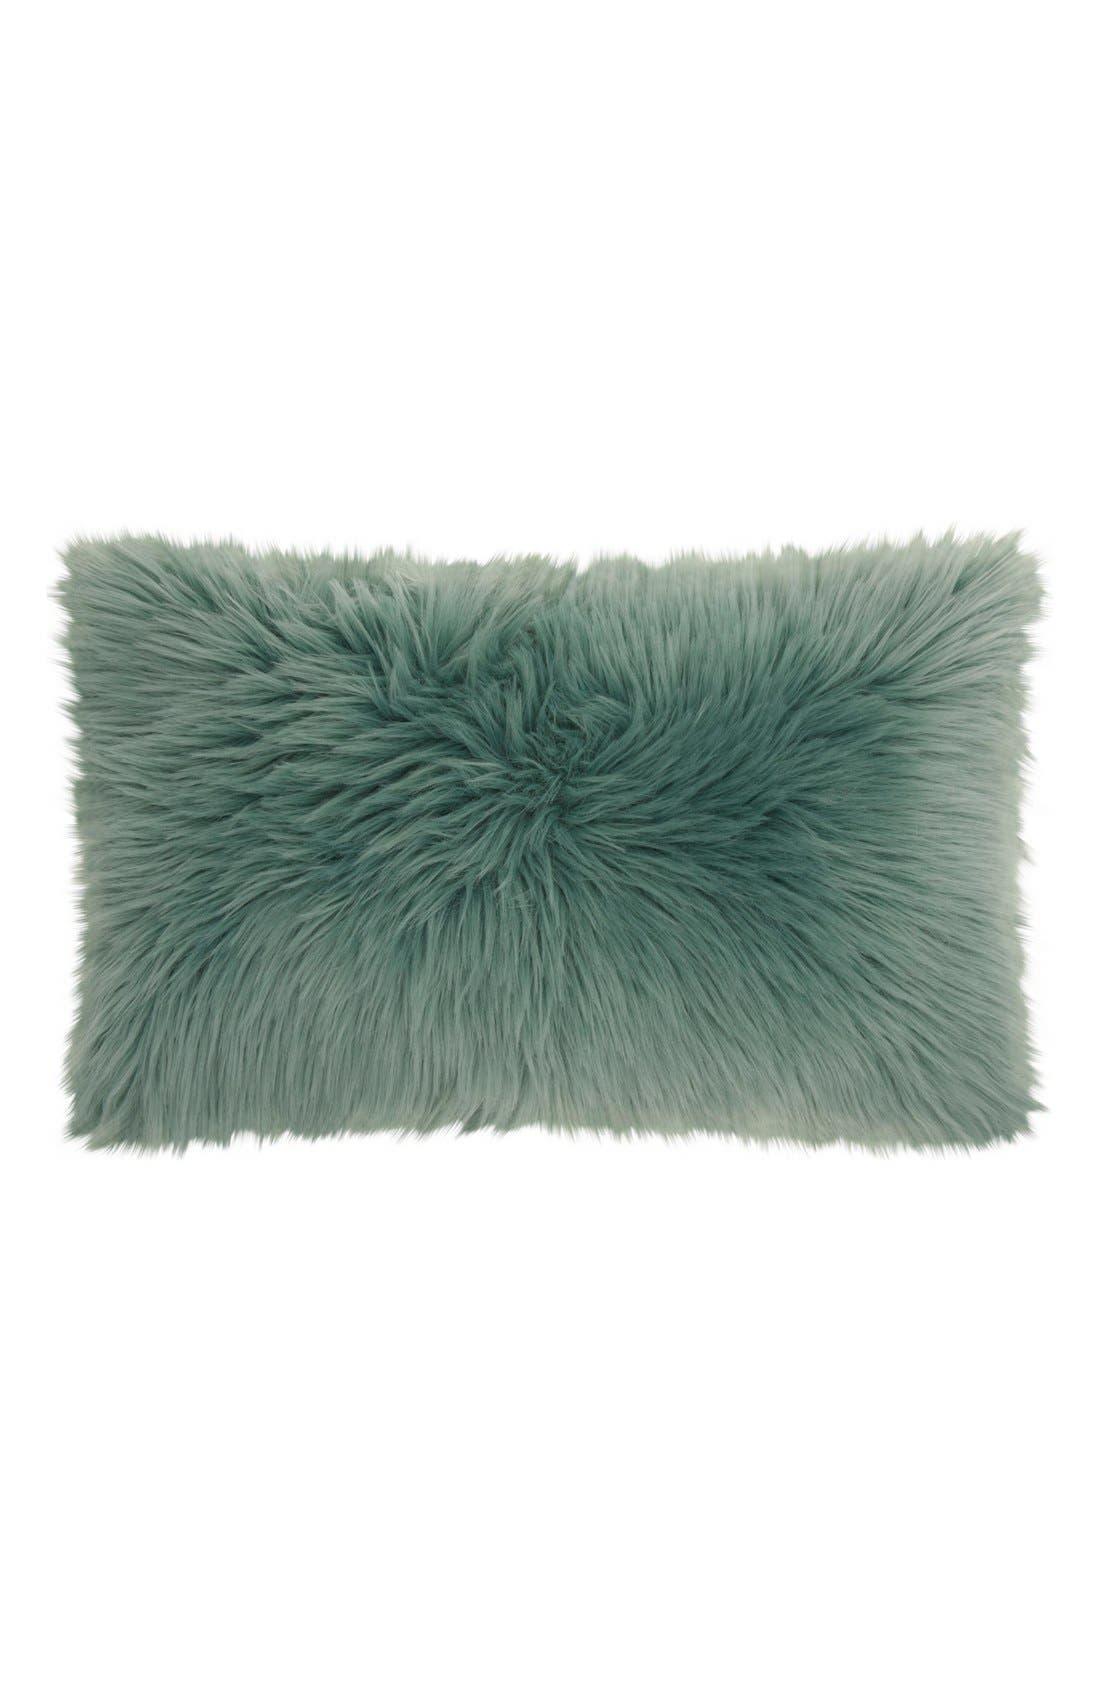 Alternate Image 1 Selected - Mina Victory 'Sumptuous' Faux Fur Accent Pillow